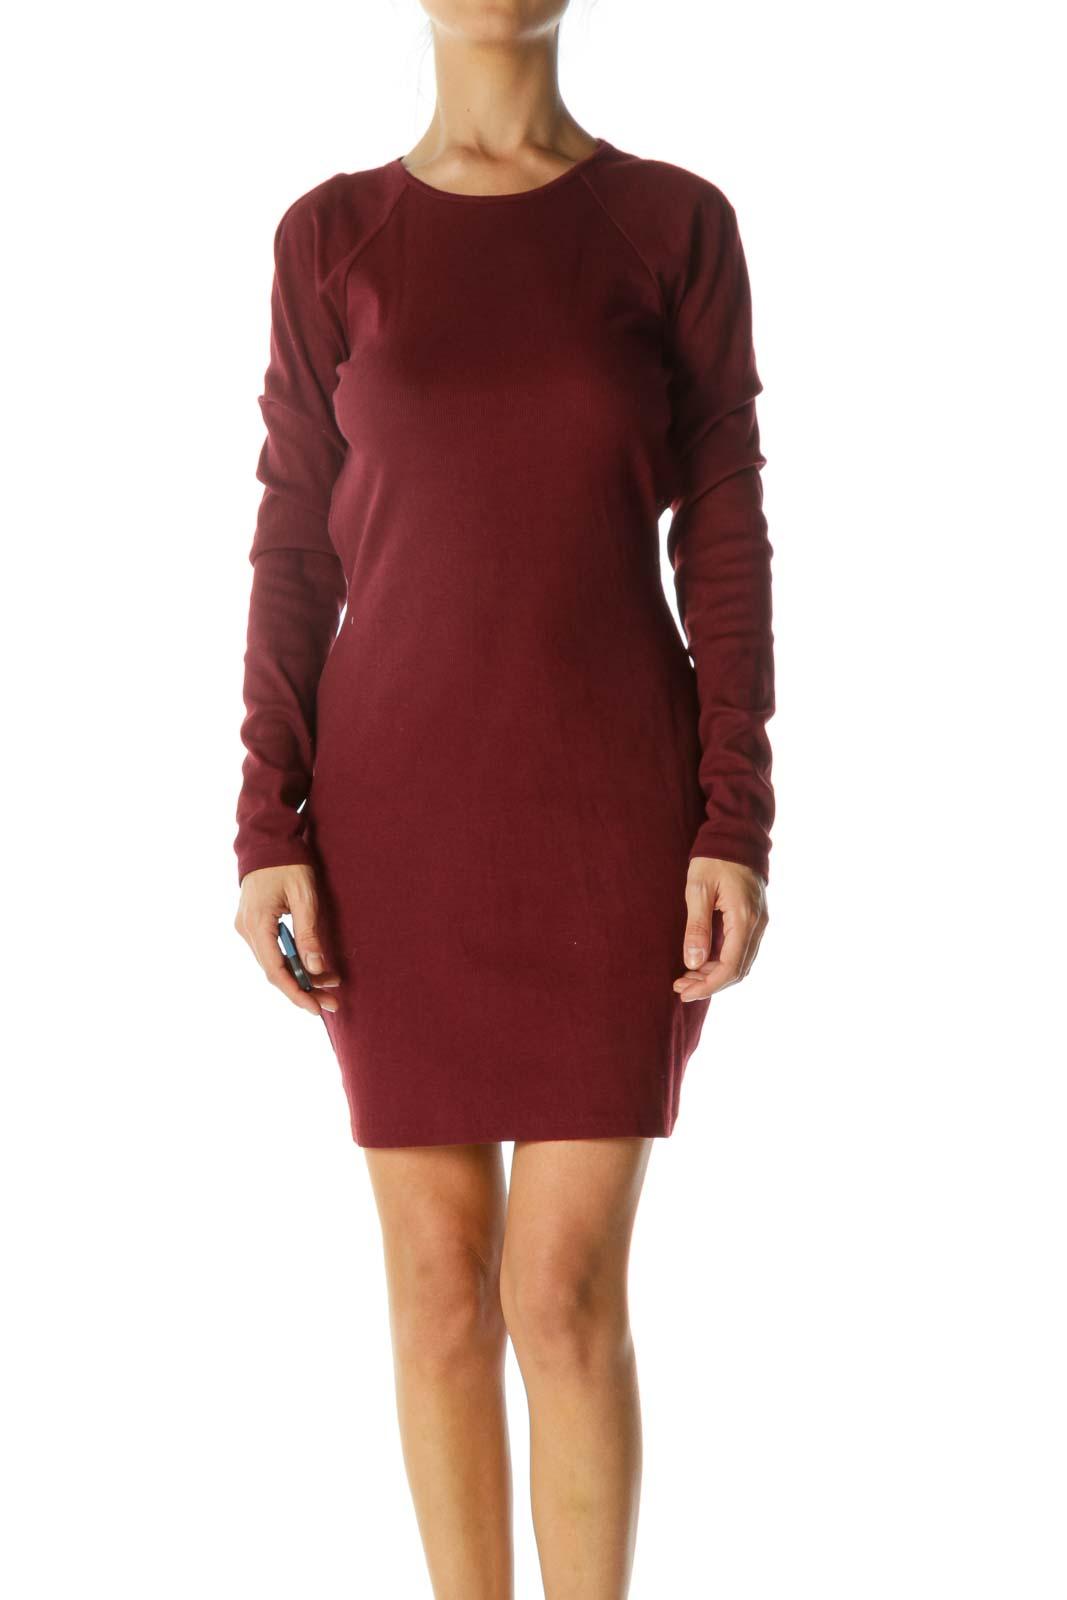 Burgundy Open-Back Long Sleeve Stretch Dress Front